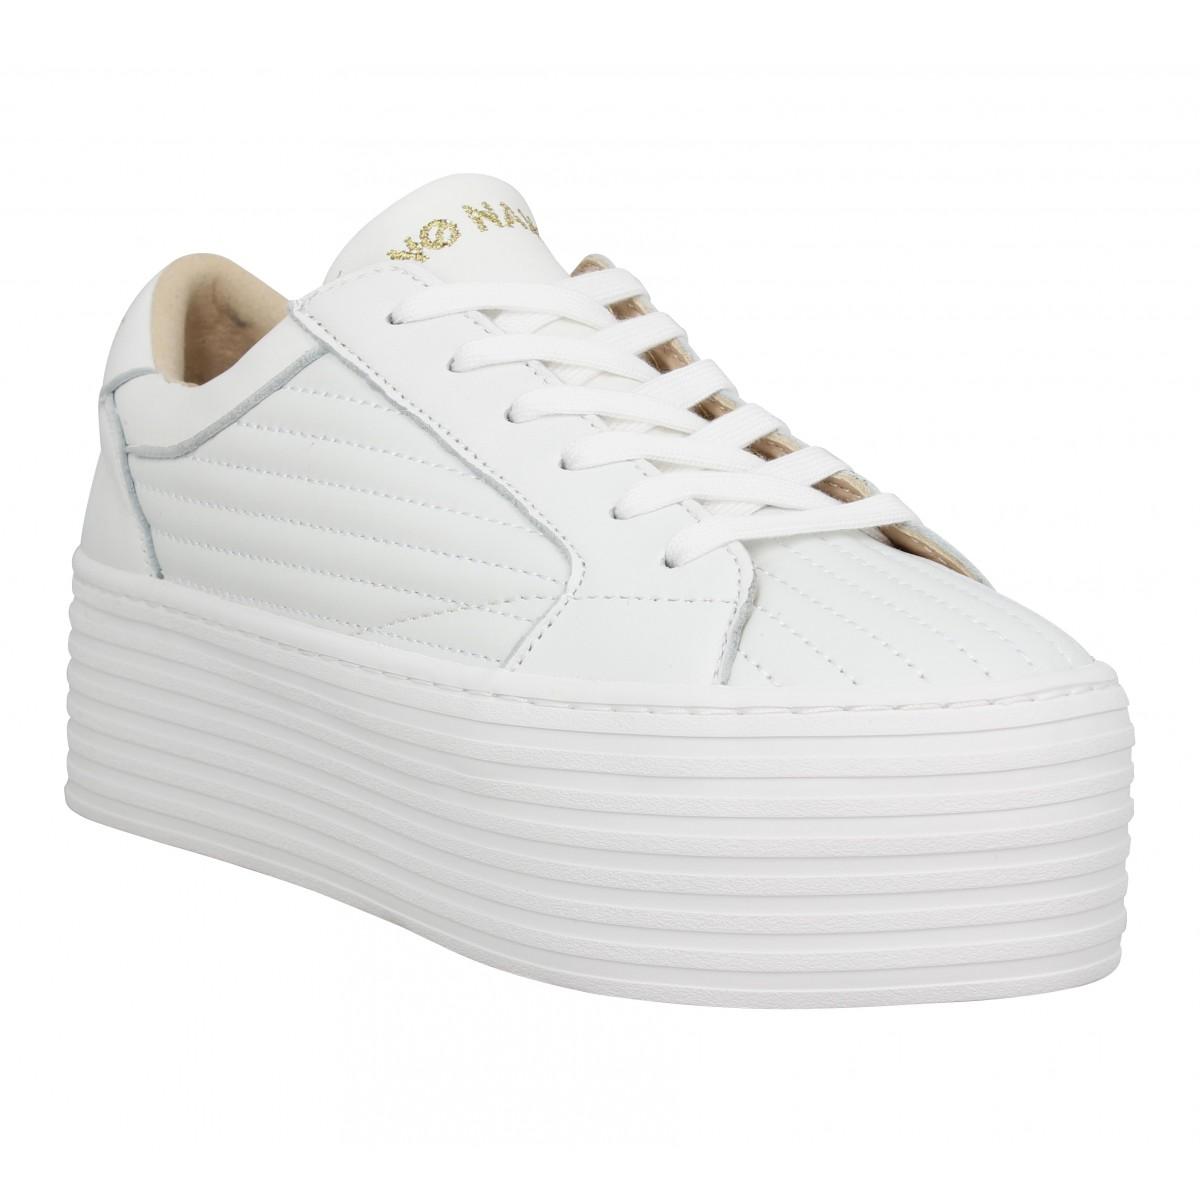 Baskets NO NAME Spice Sneaker lambskin Femme Blanc